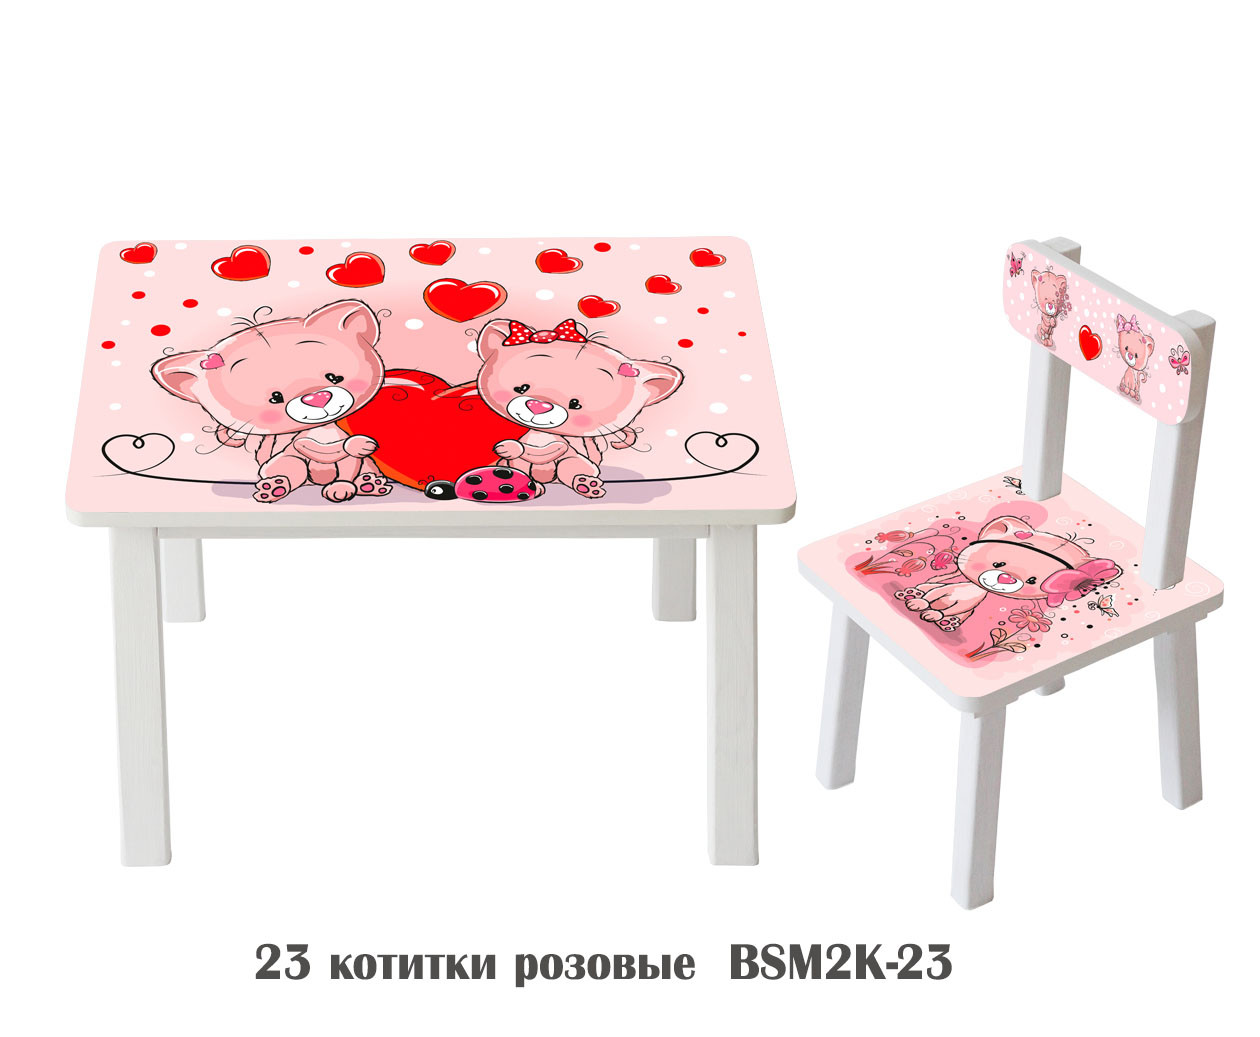 "=IFERROR(__xludf.DUMMYFUNCTION(""GOOGLETRANSLATE(B9453,""""ru"""", """"uk"""")""),""Дитячий стіл і стілець BSM2K-23 Pink"